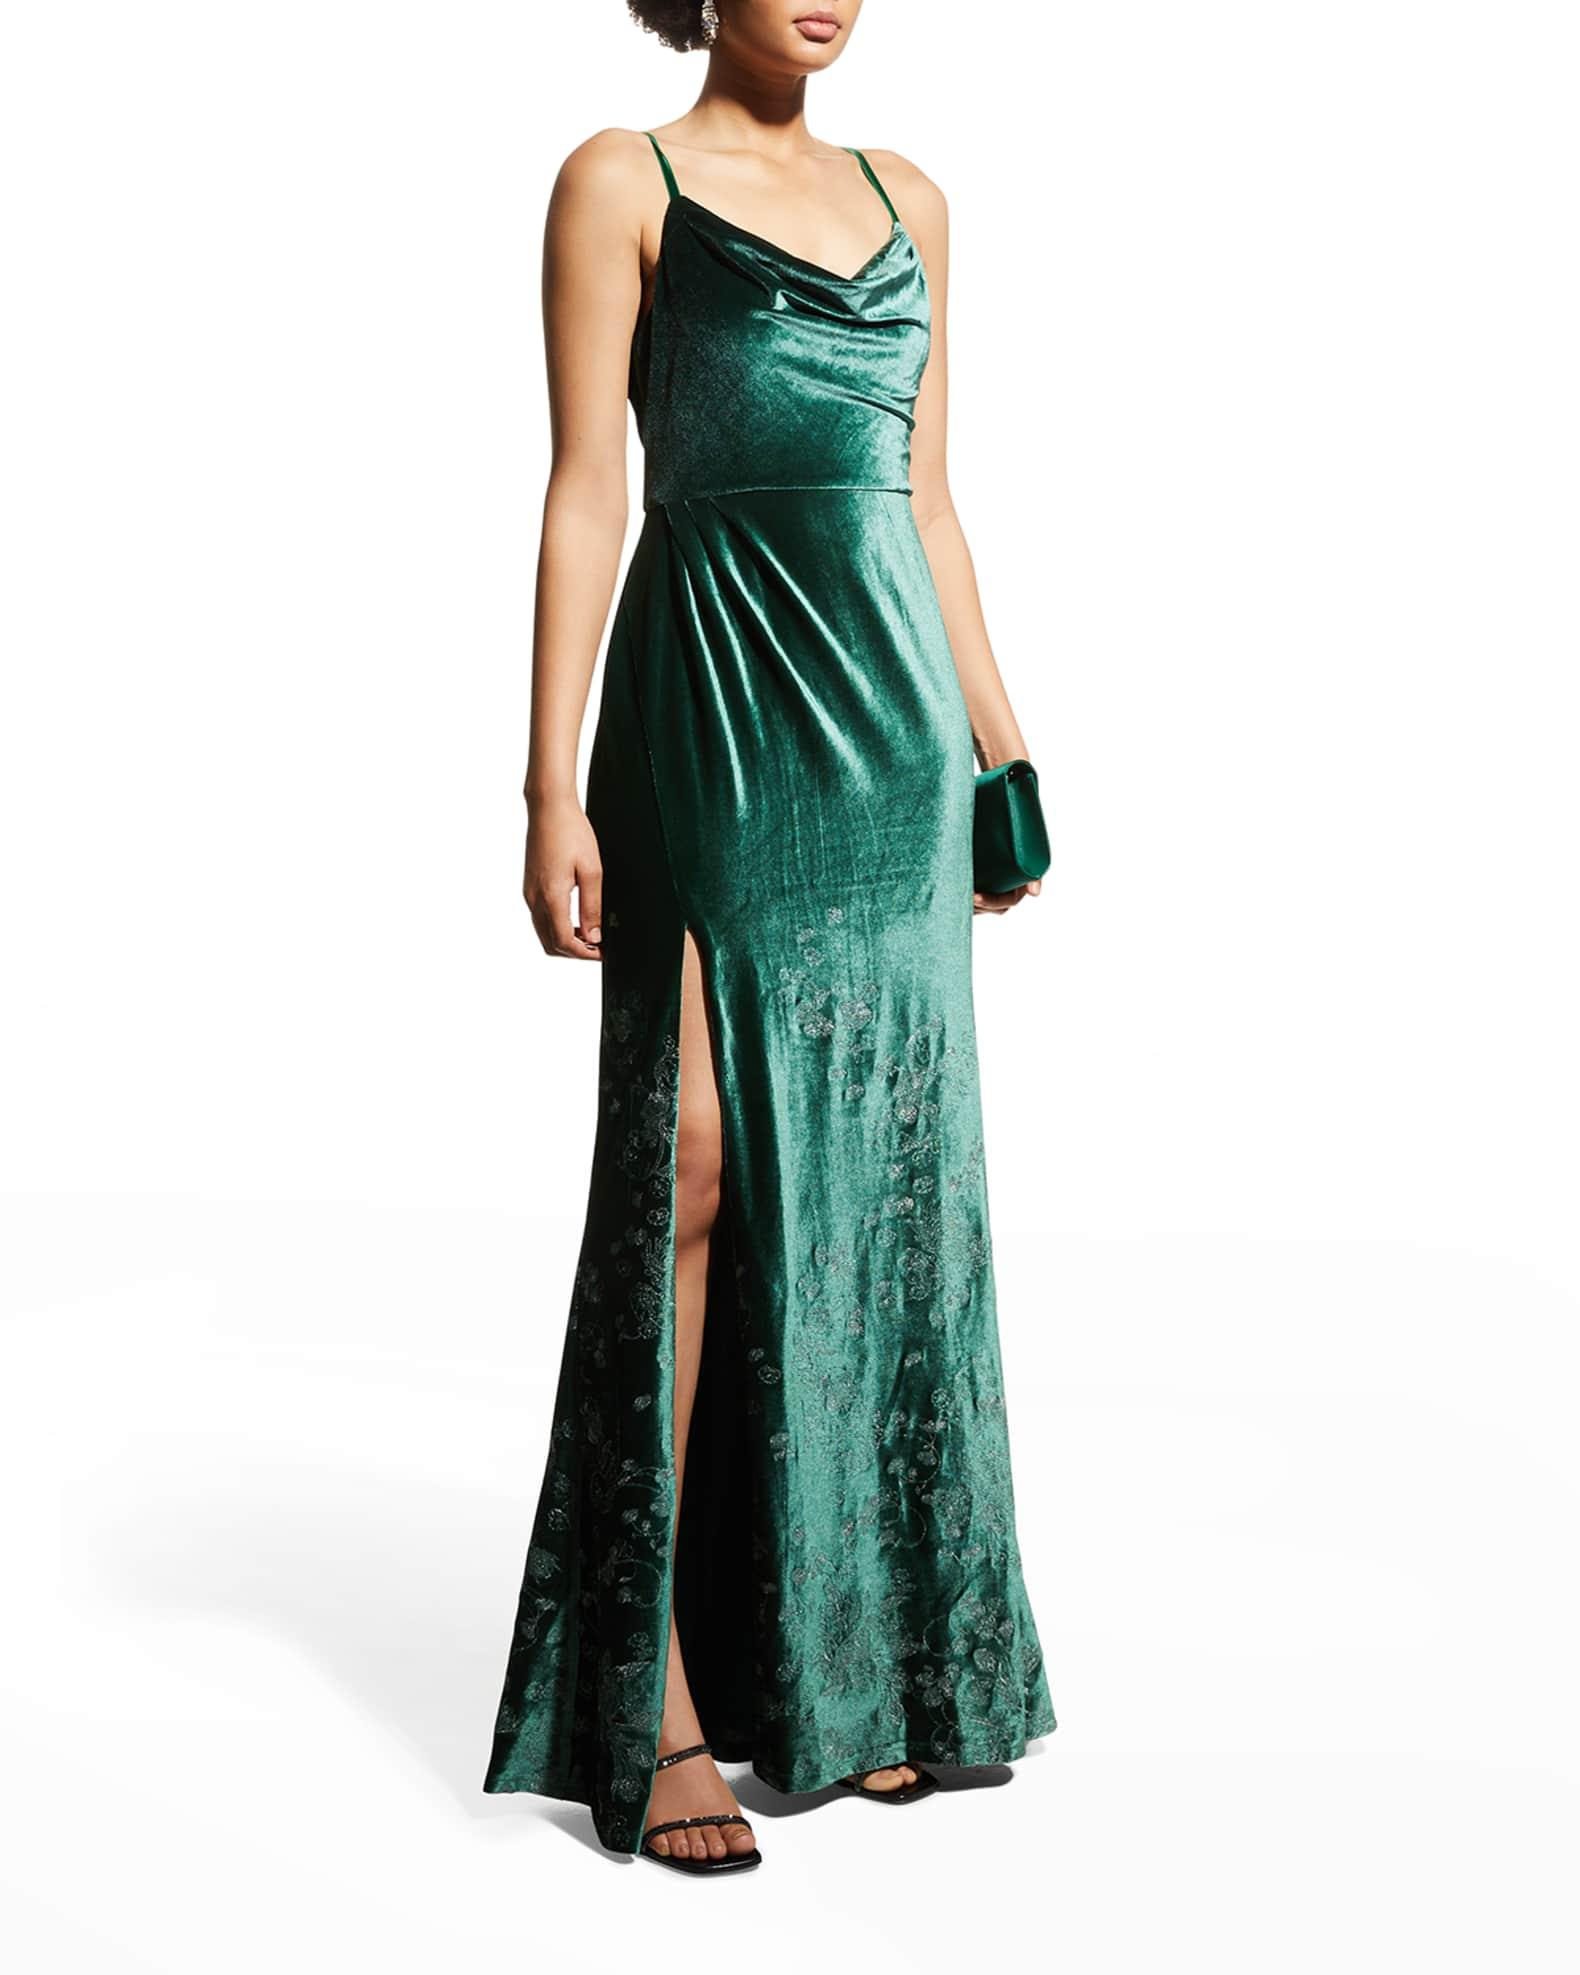 MARCHESA NOTTE Sage Green Cowl-Neck Embroidered Velvet Gown